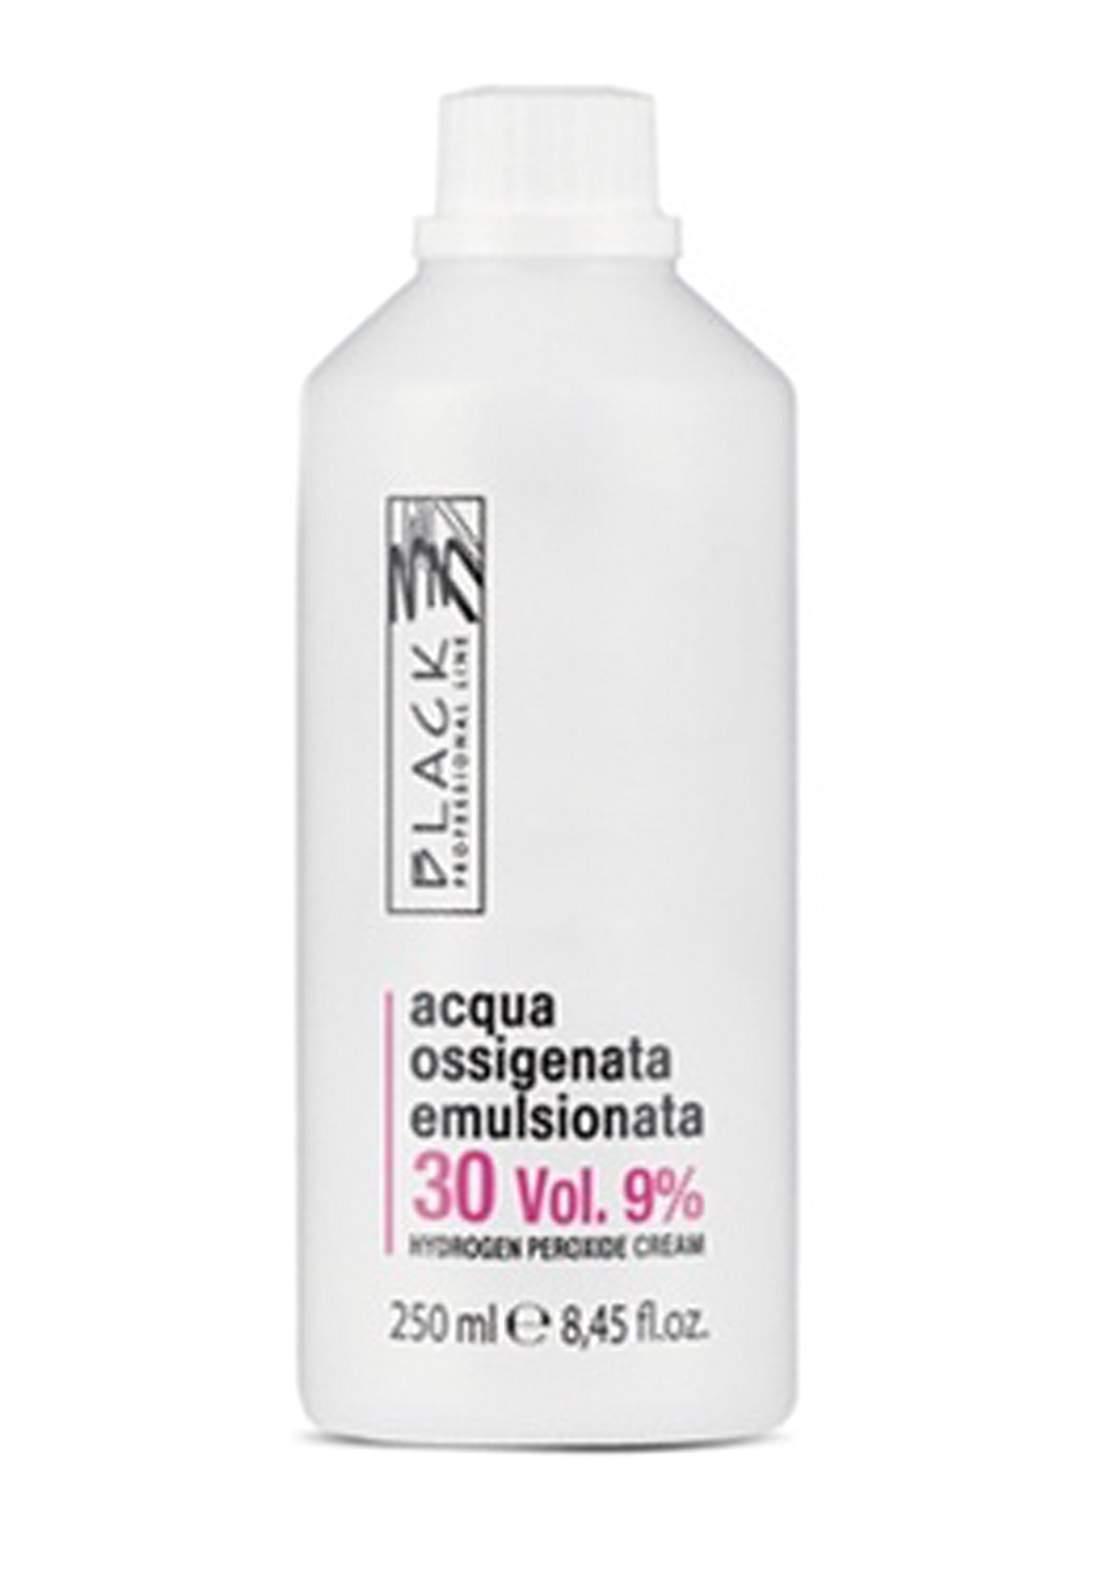 Black Professional Creamy 9% Hydrogen Peroxide 250ml - Oxidizing Cream 30vol كريم مؤكسد للصبغة